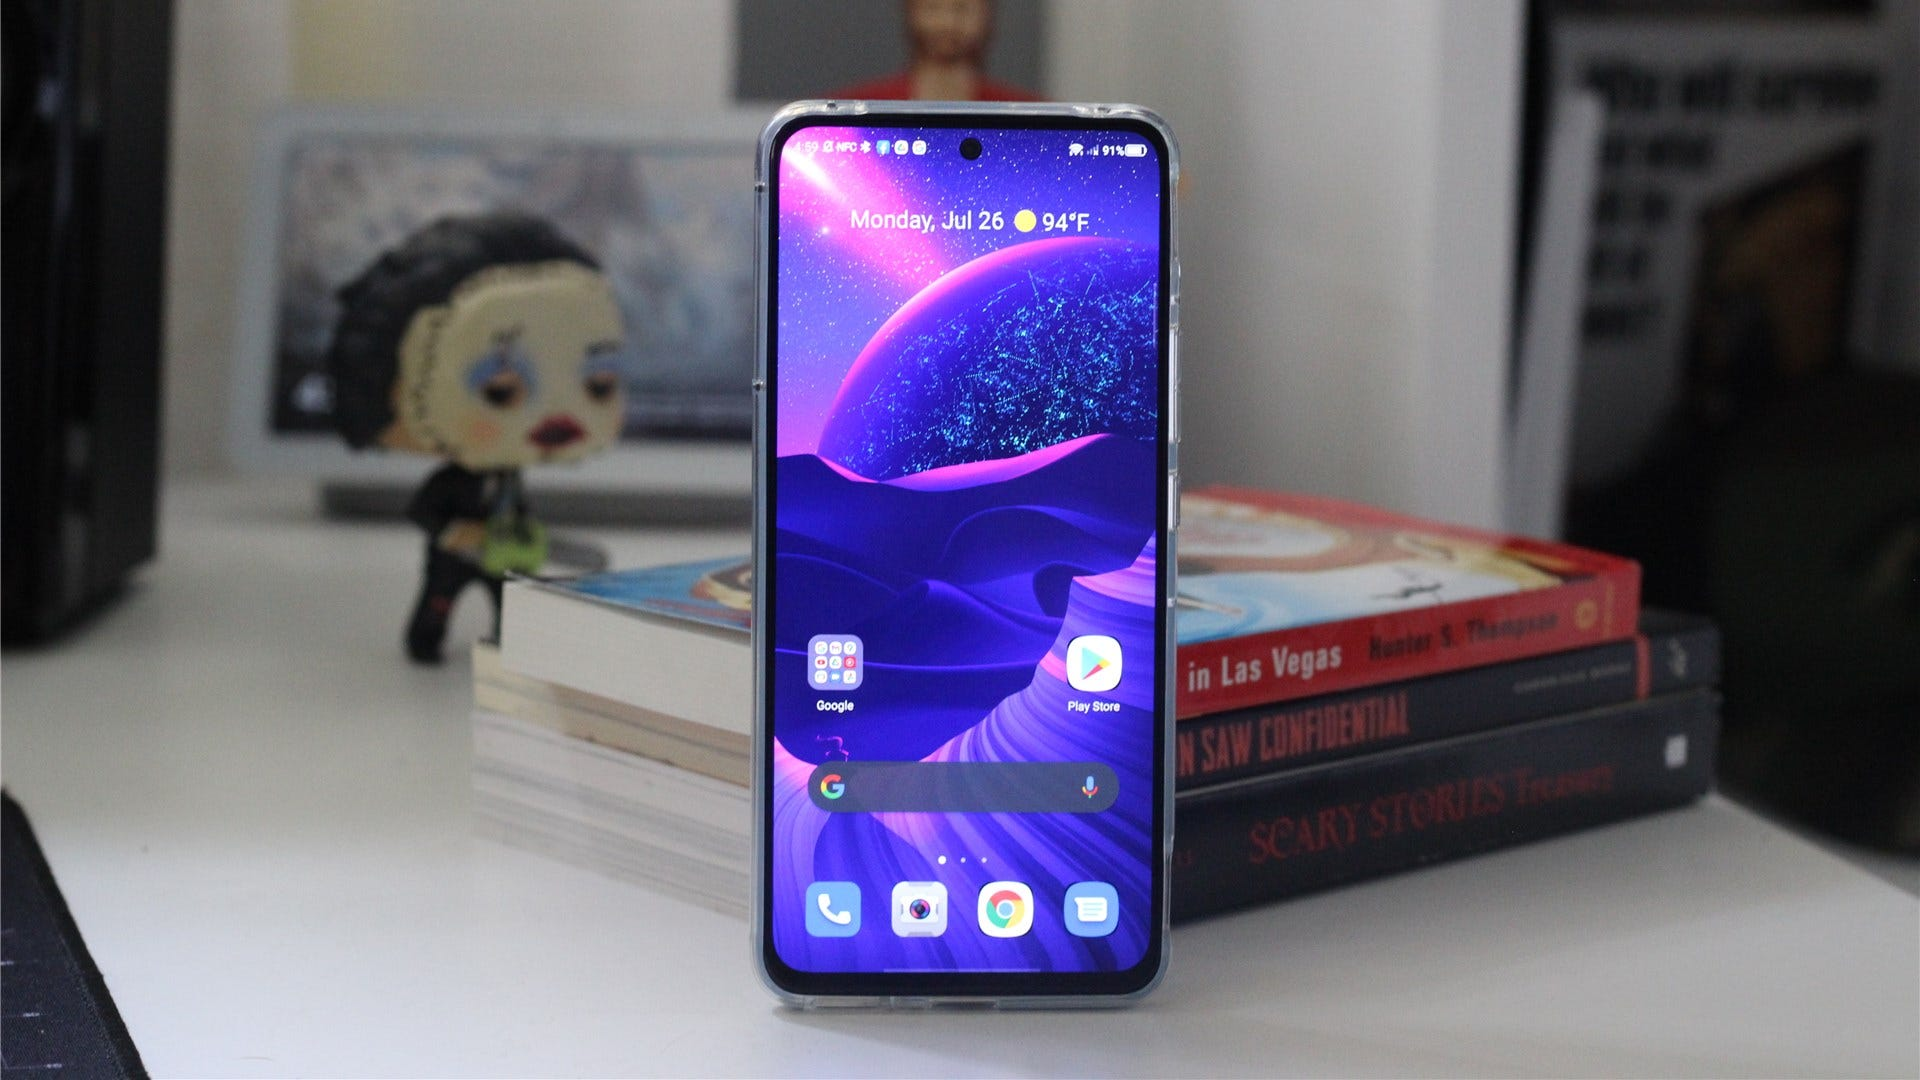 the phone's display